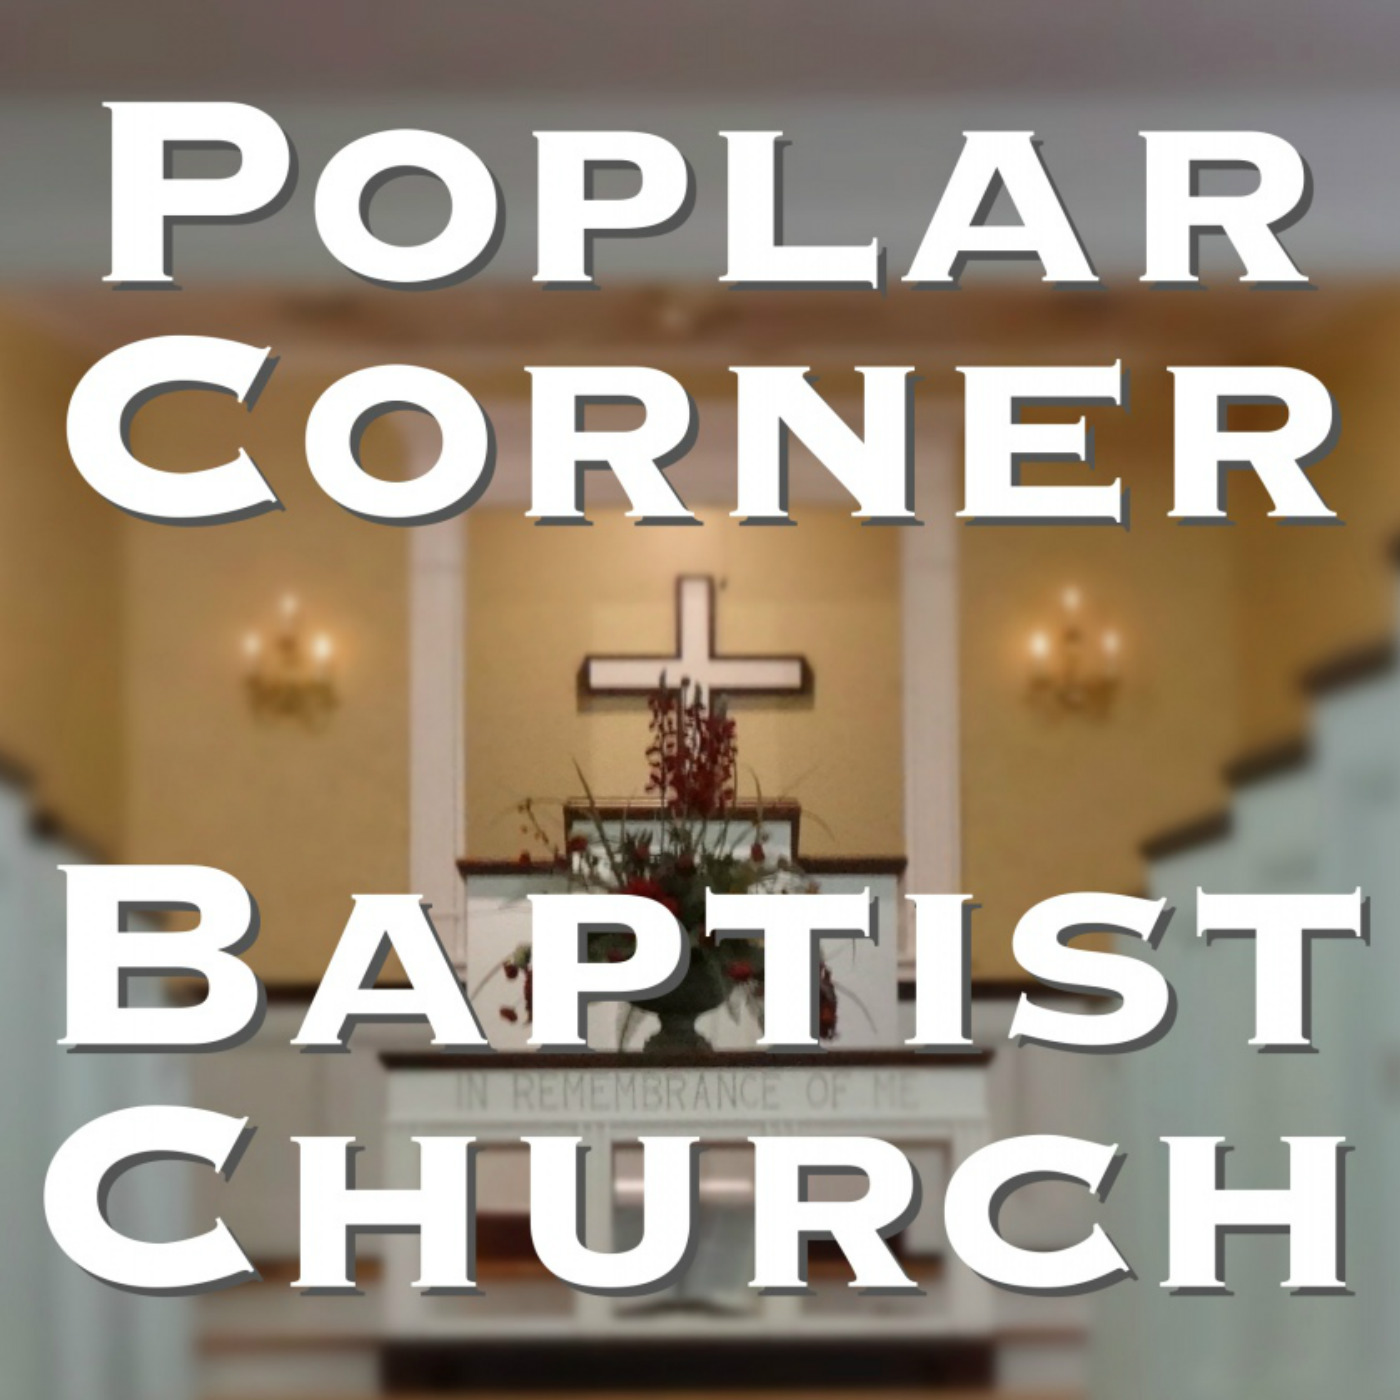 Poplar Corner Baptist Church